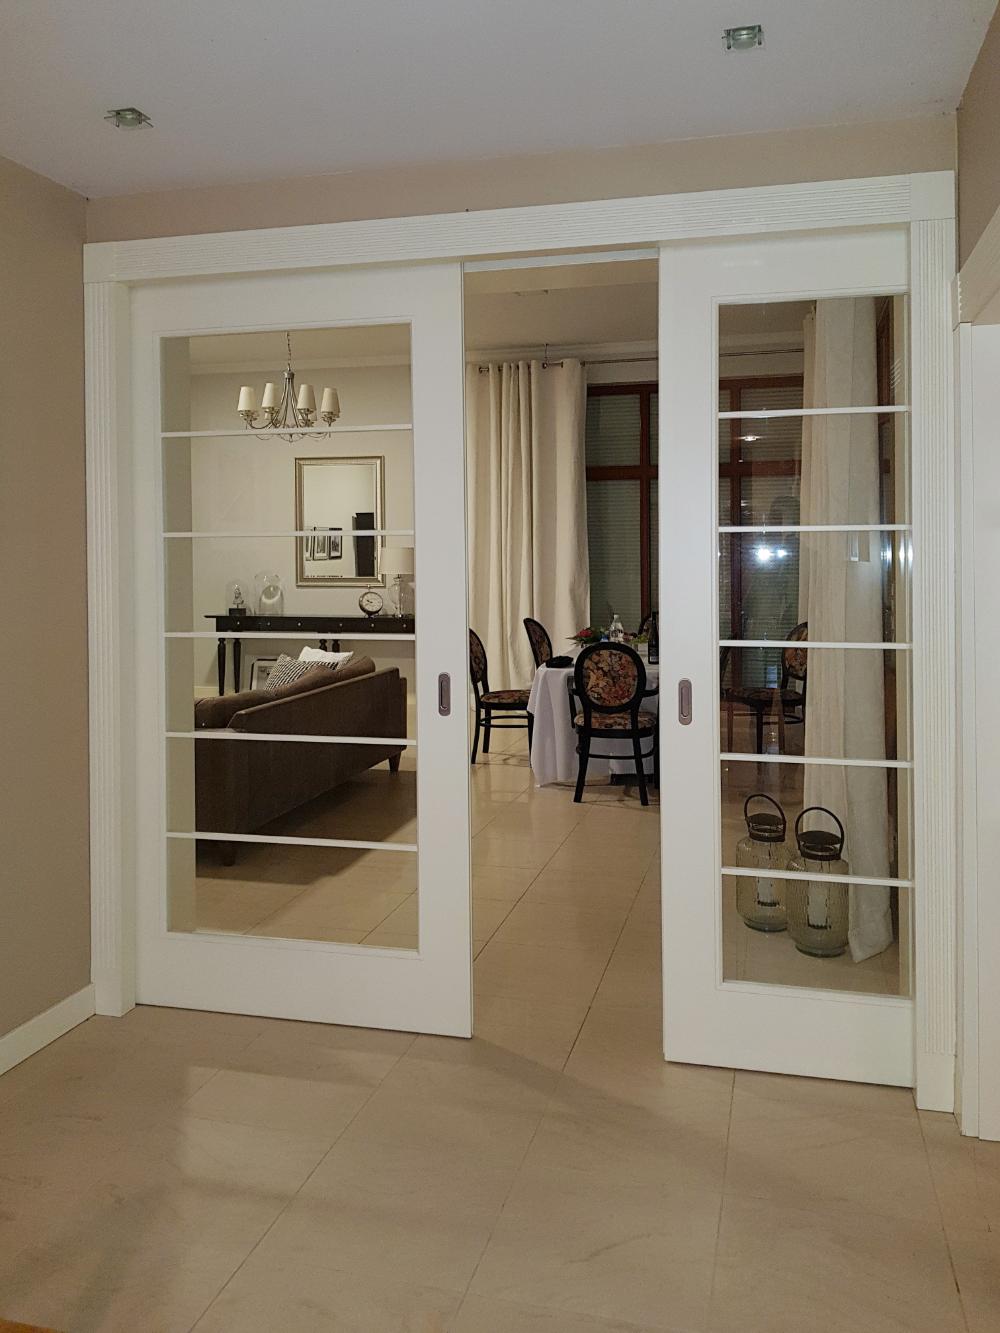 Drzwi Przesuwne Classic House Exterior Elegant Home Decor Kitchen Design Small